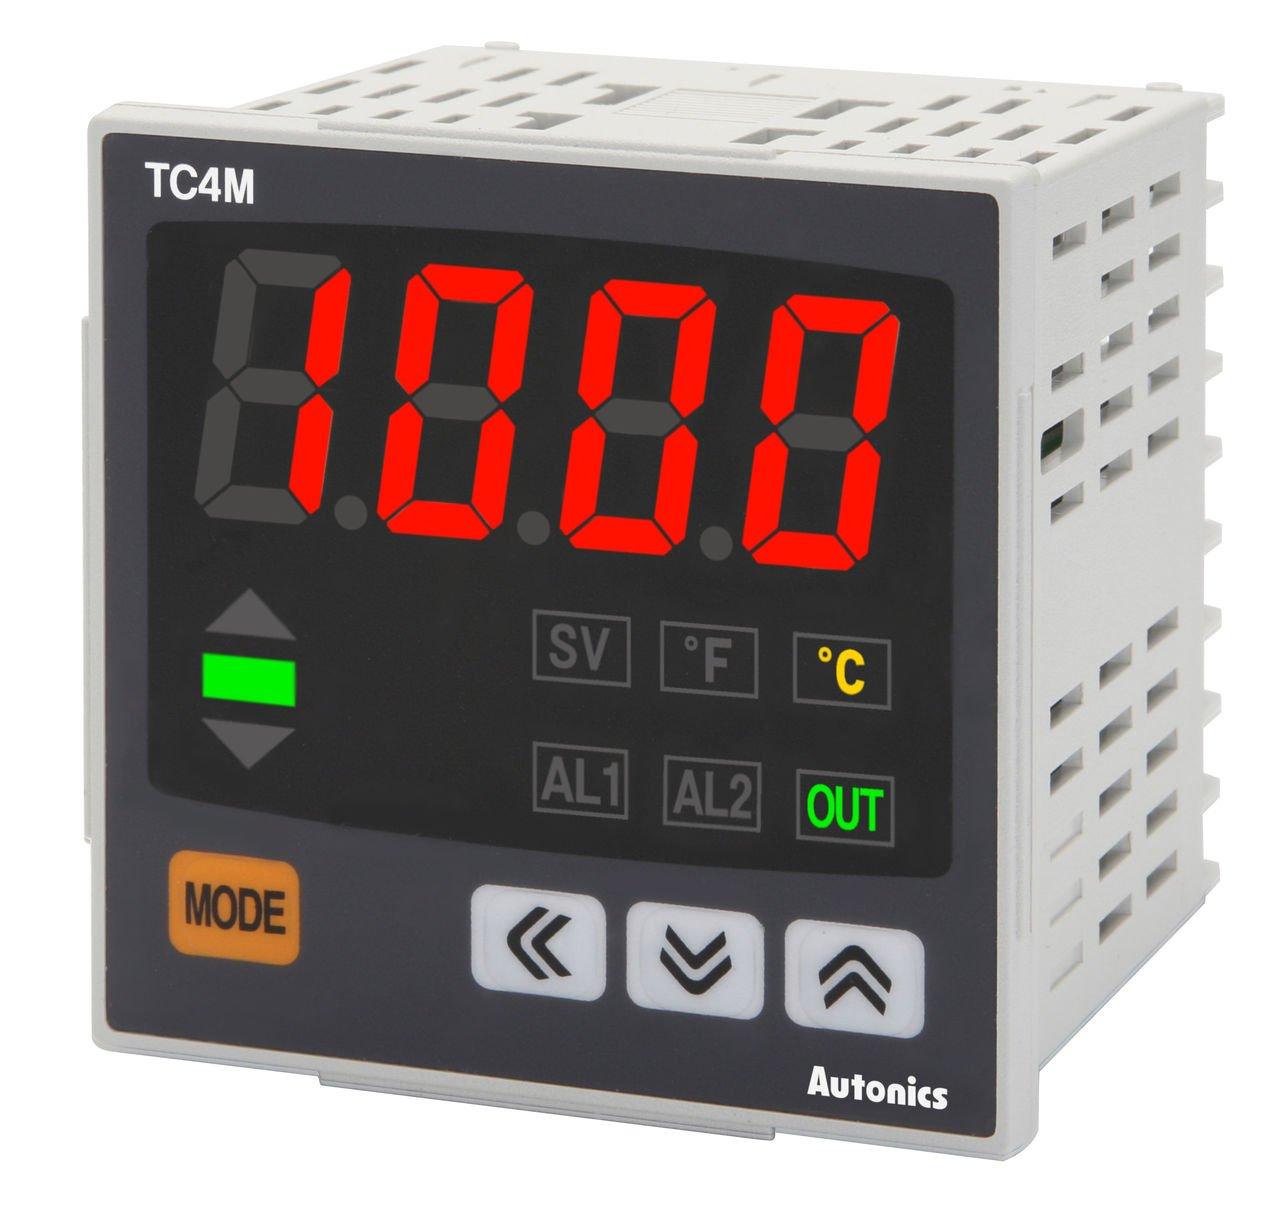 Autonics TC4M-24R Temp Control, W72 x H72, Single display 4 Digit, PID Control, Relay & SSR Output, 2 Alarm Output, 100-240 VAC